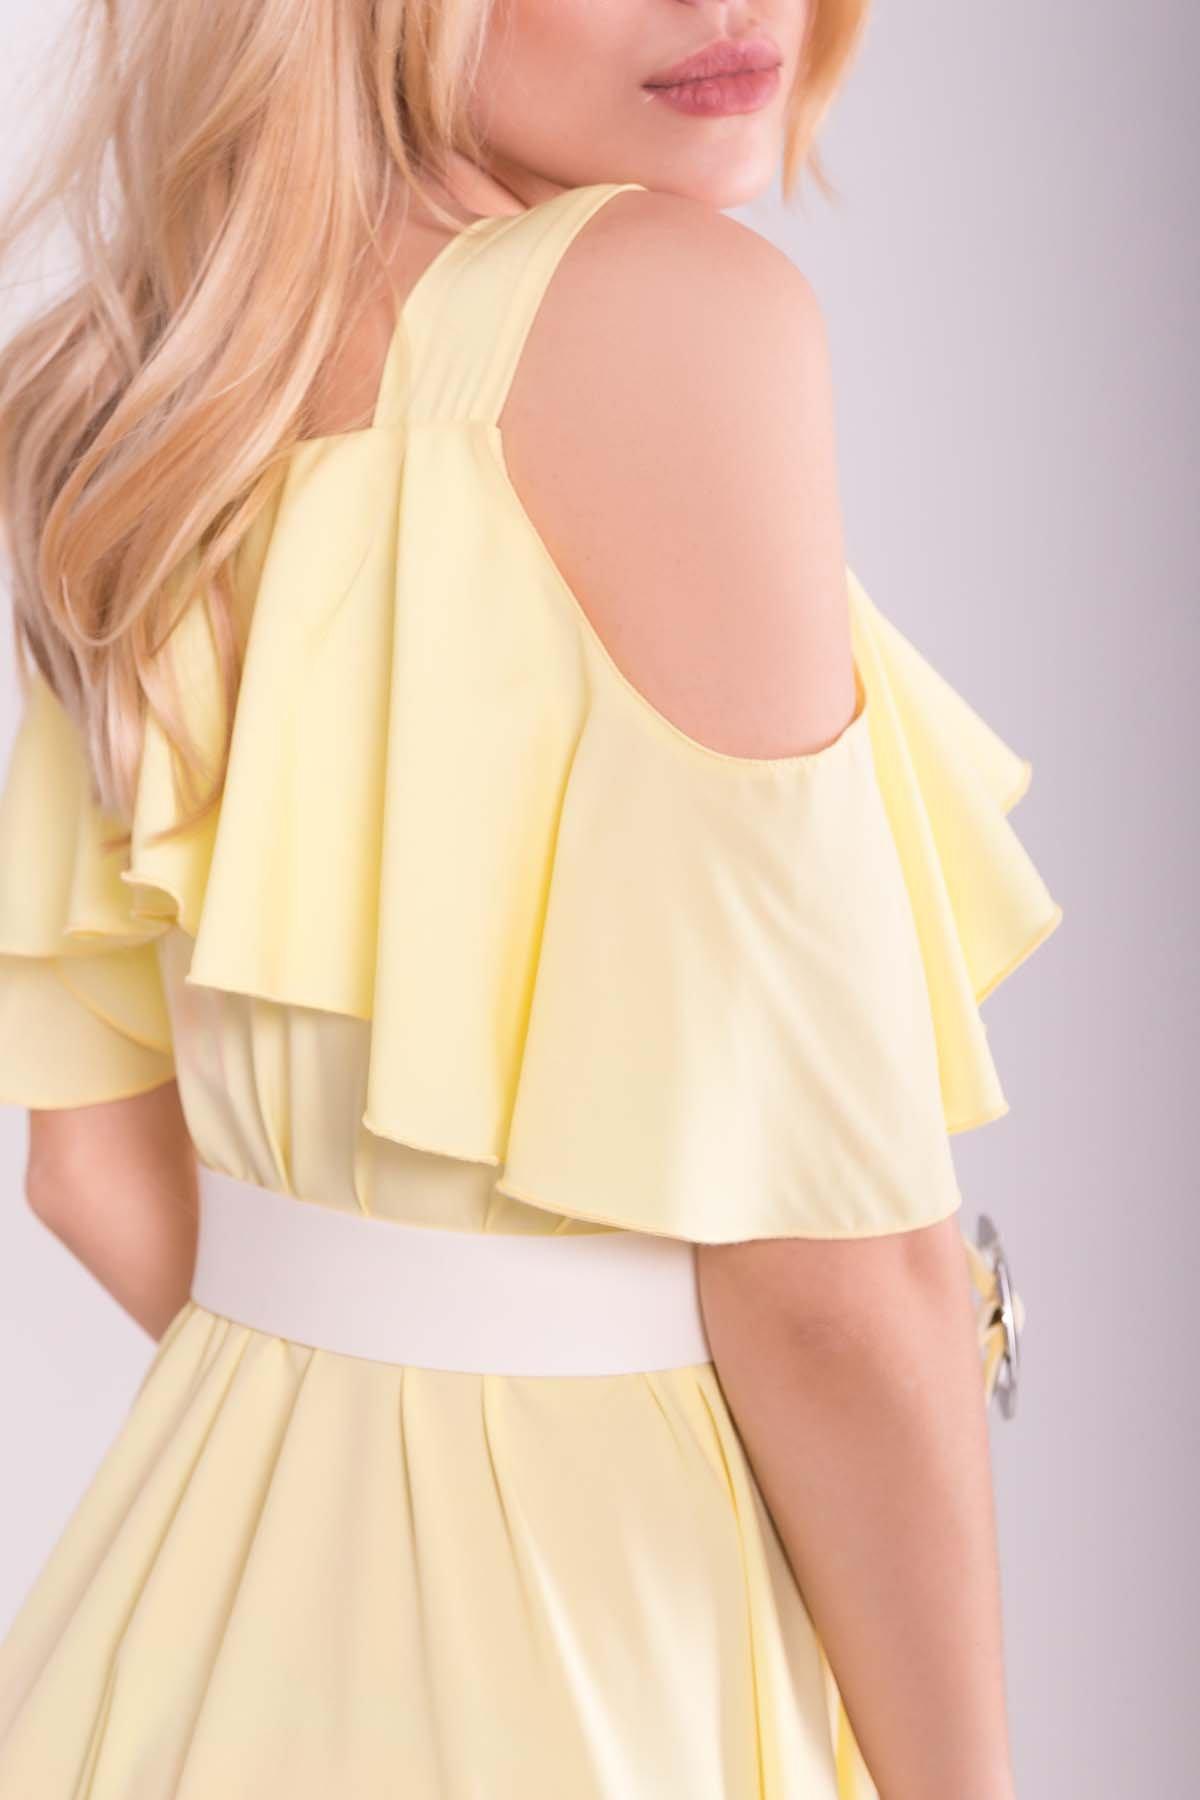 Платье Нуара 7358 АРТ. 43101 Цвет: Желтый - фото 4, интернет магазин tm-modus.ru